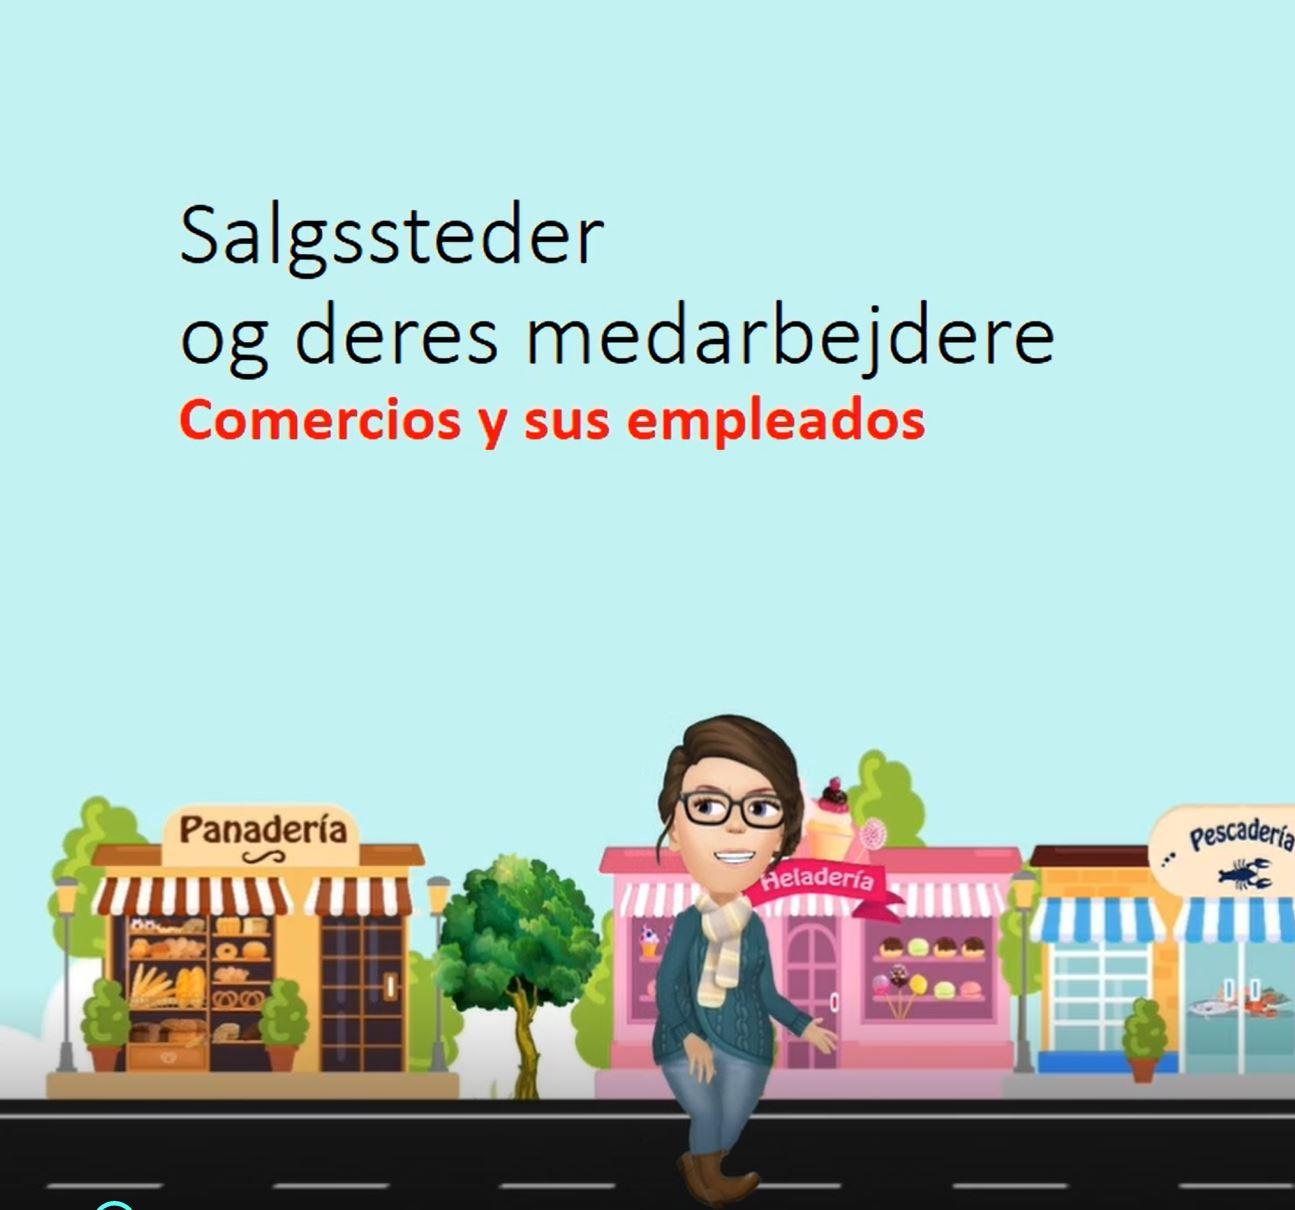 Butikker og salgssteder